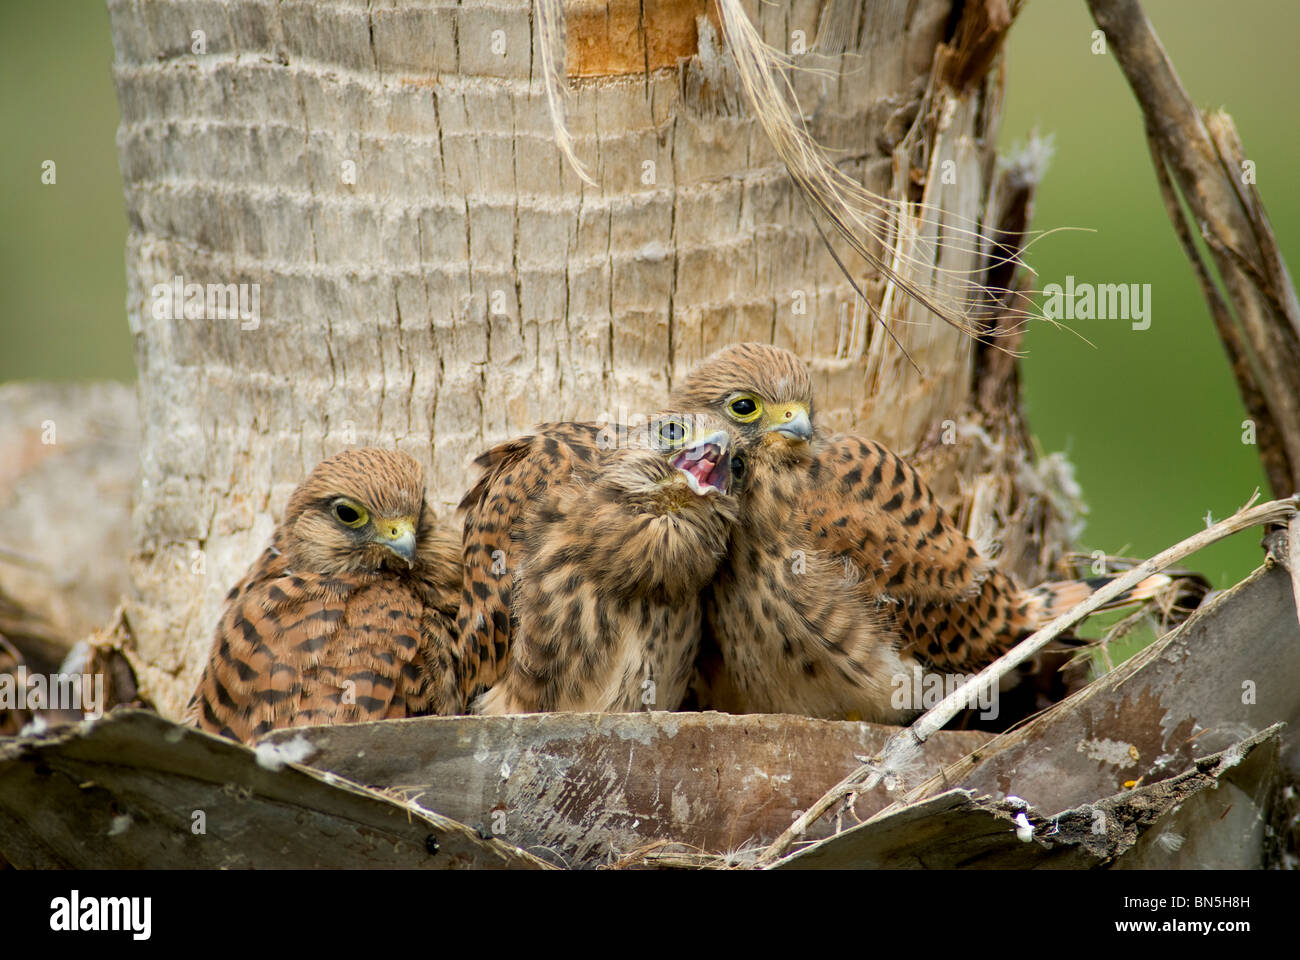 3 Kestrel chicks in nest located in palm tree - Stock Image